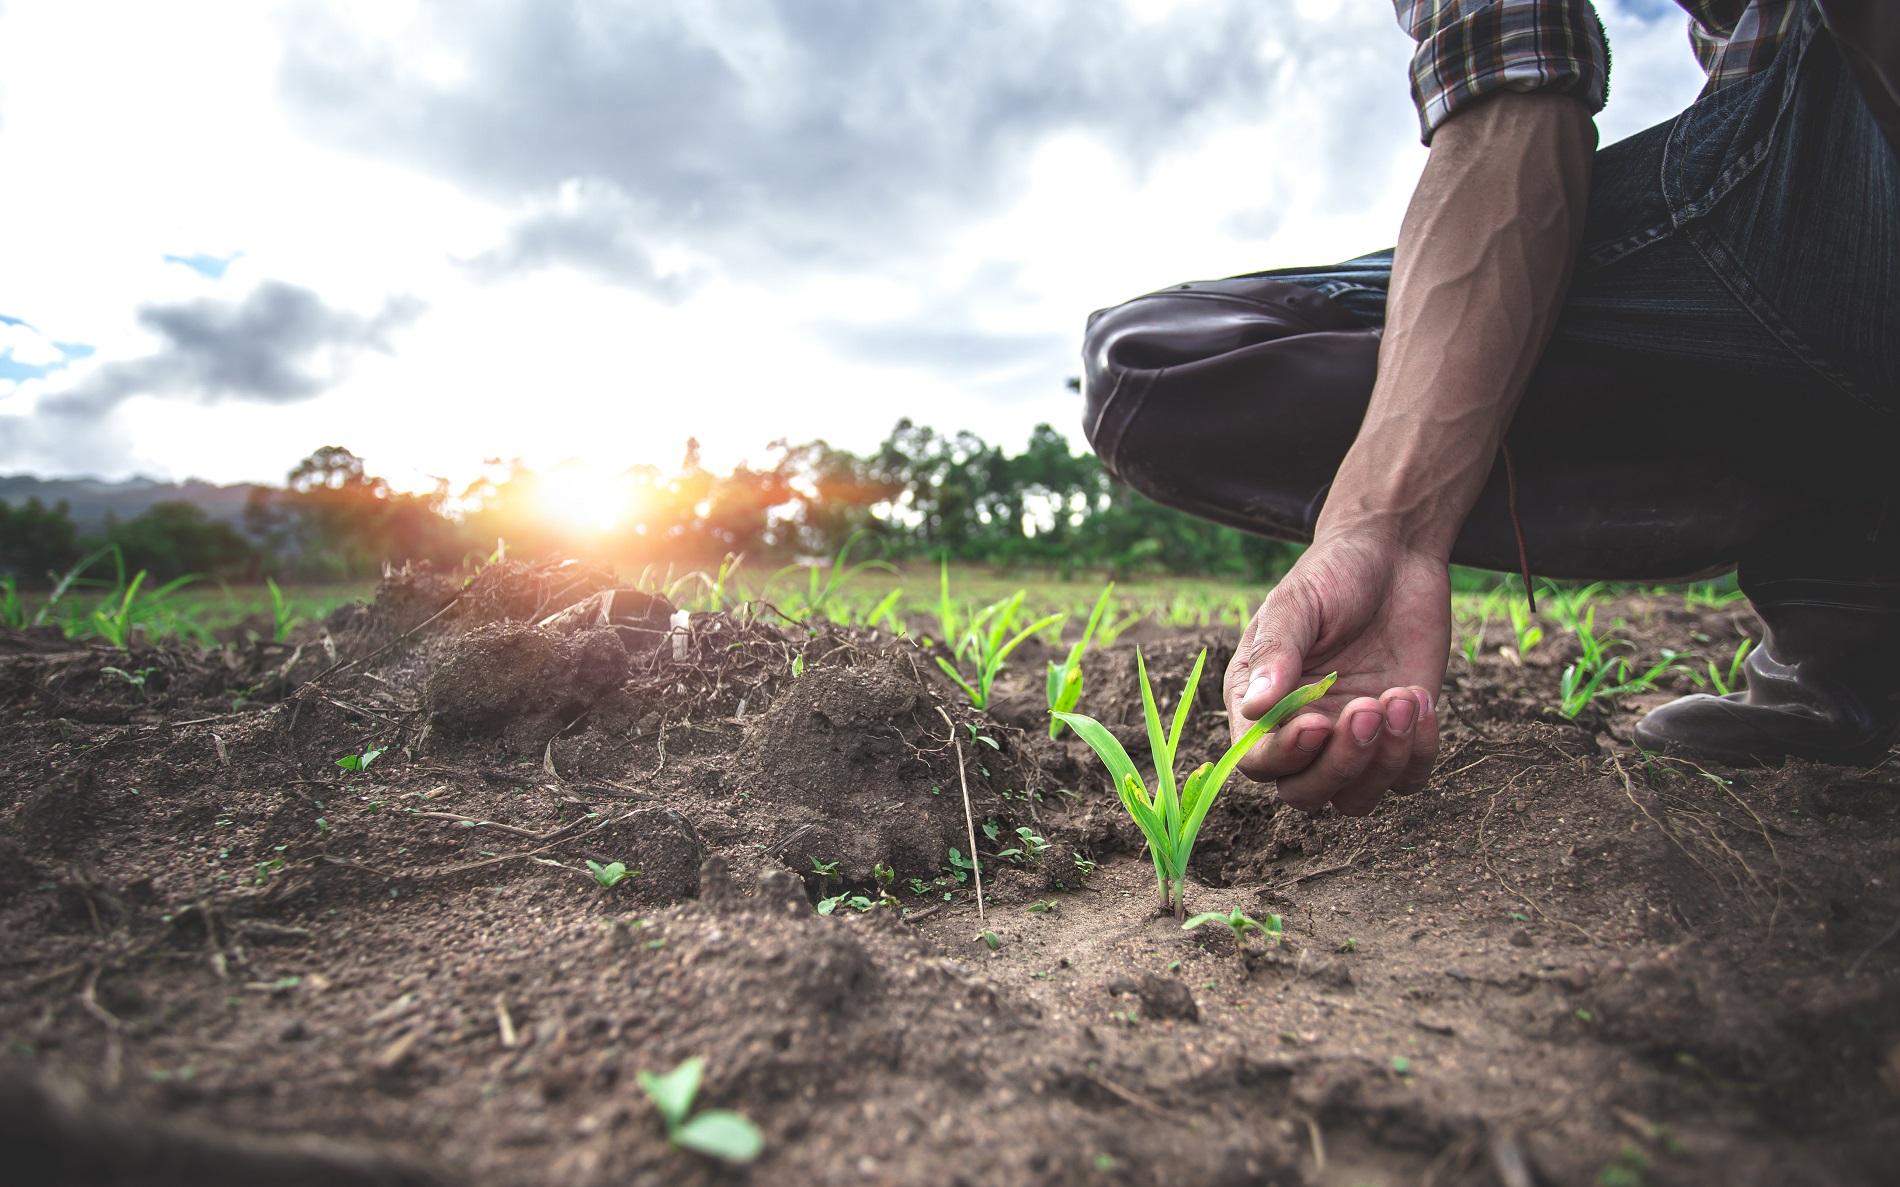 Buenas prácticas agrícolas: Rotación de cultivos